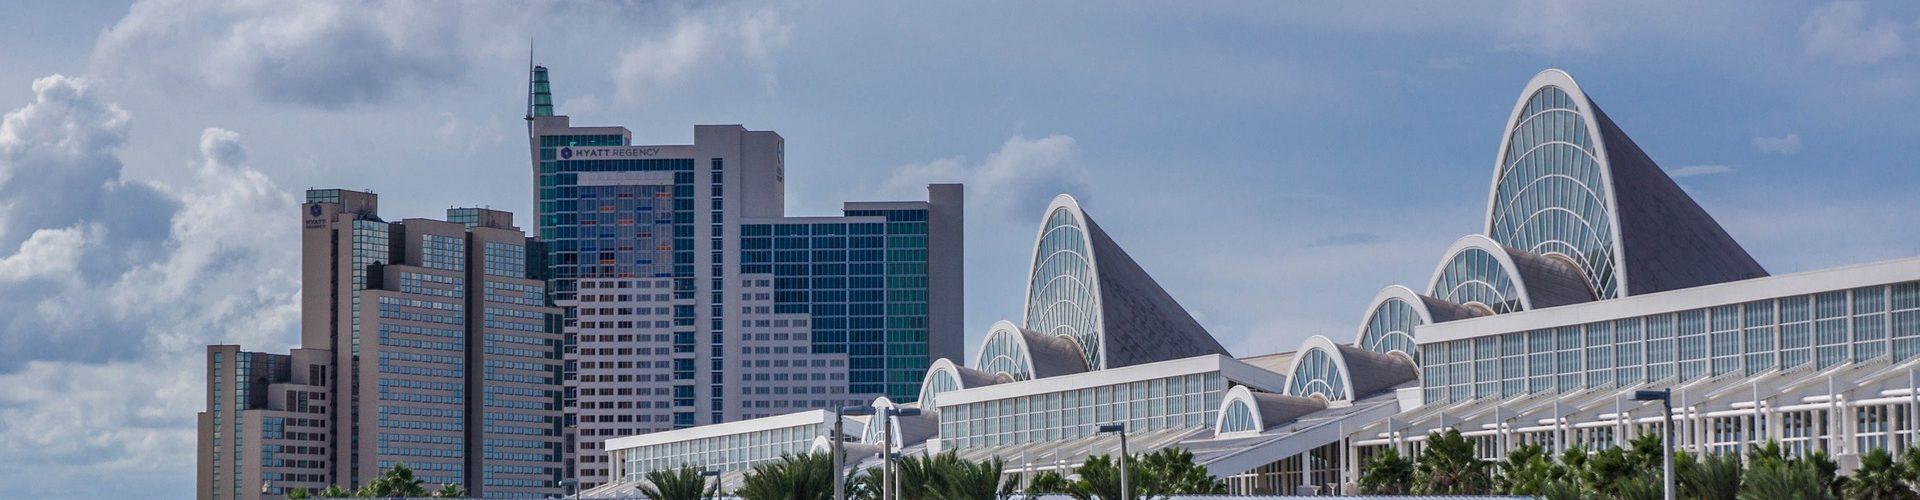 235deecbaf5 13 Tips for Anyone Moving to Orlando